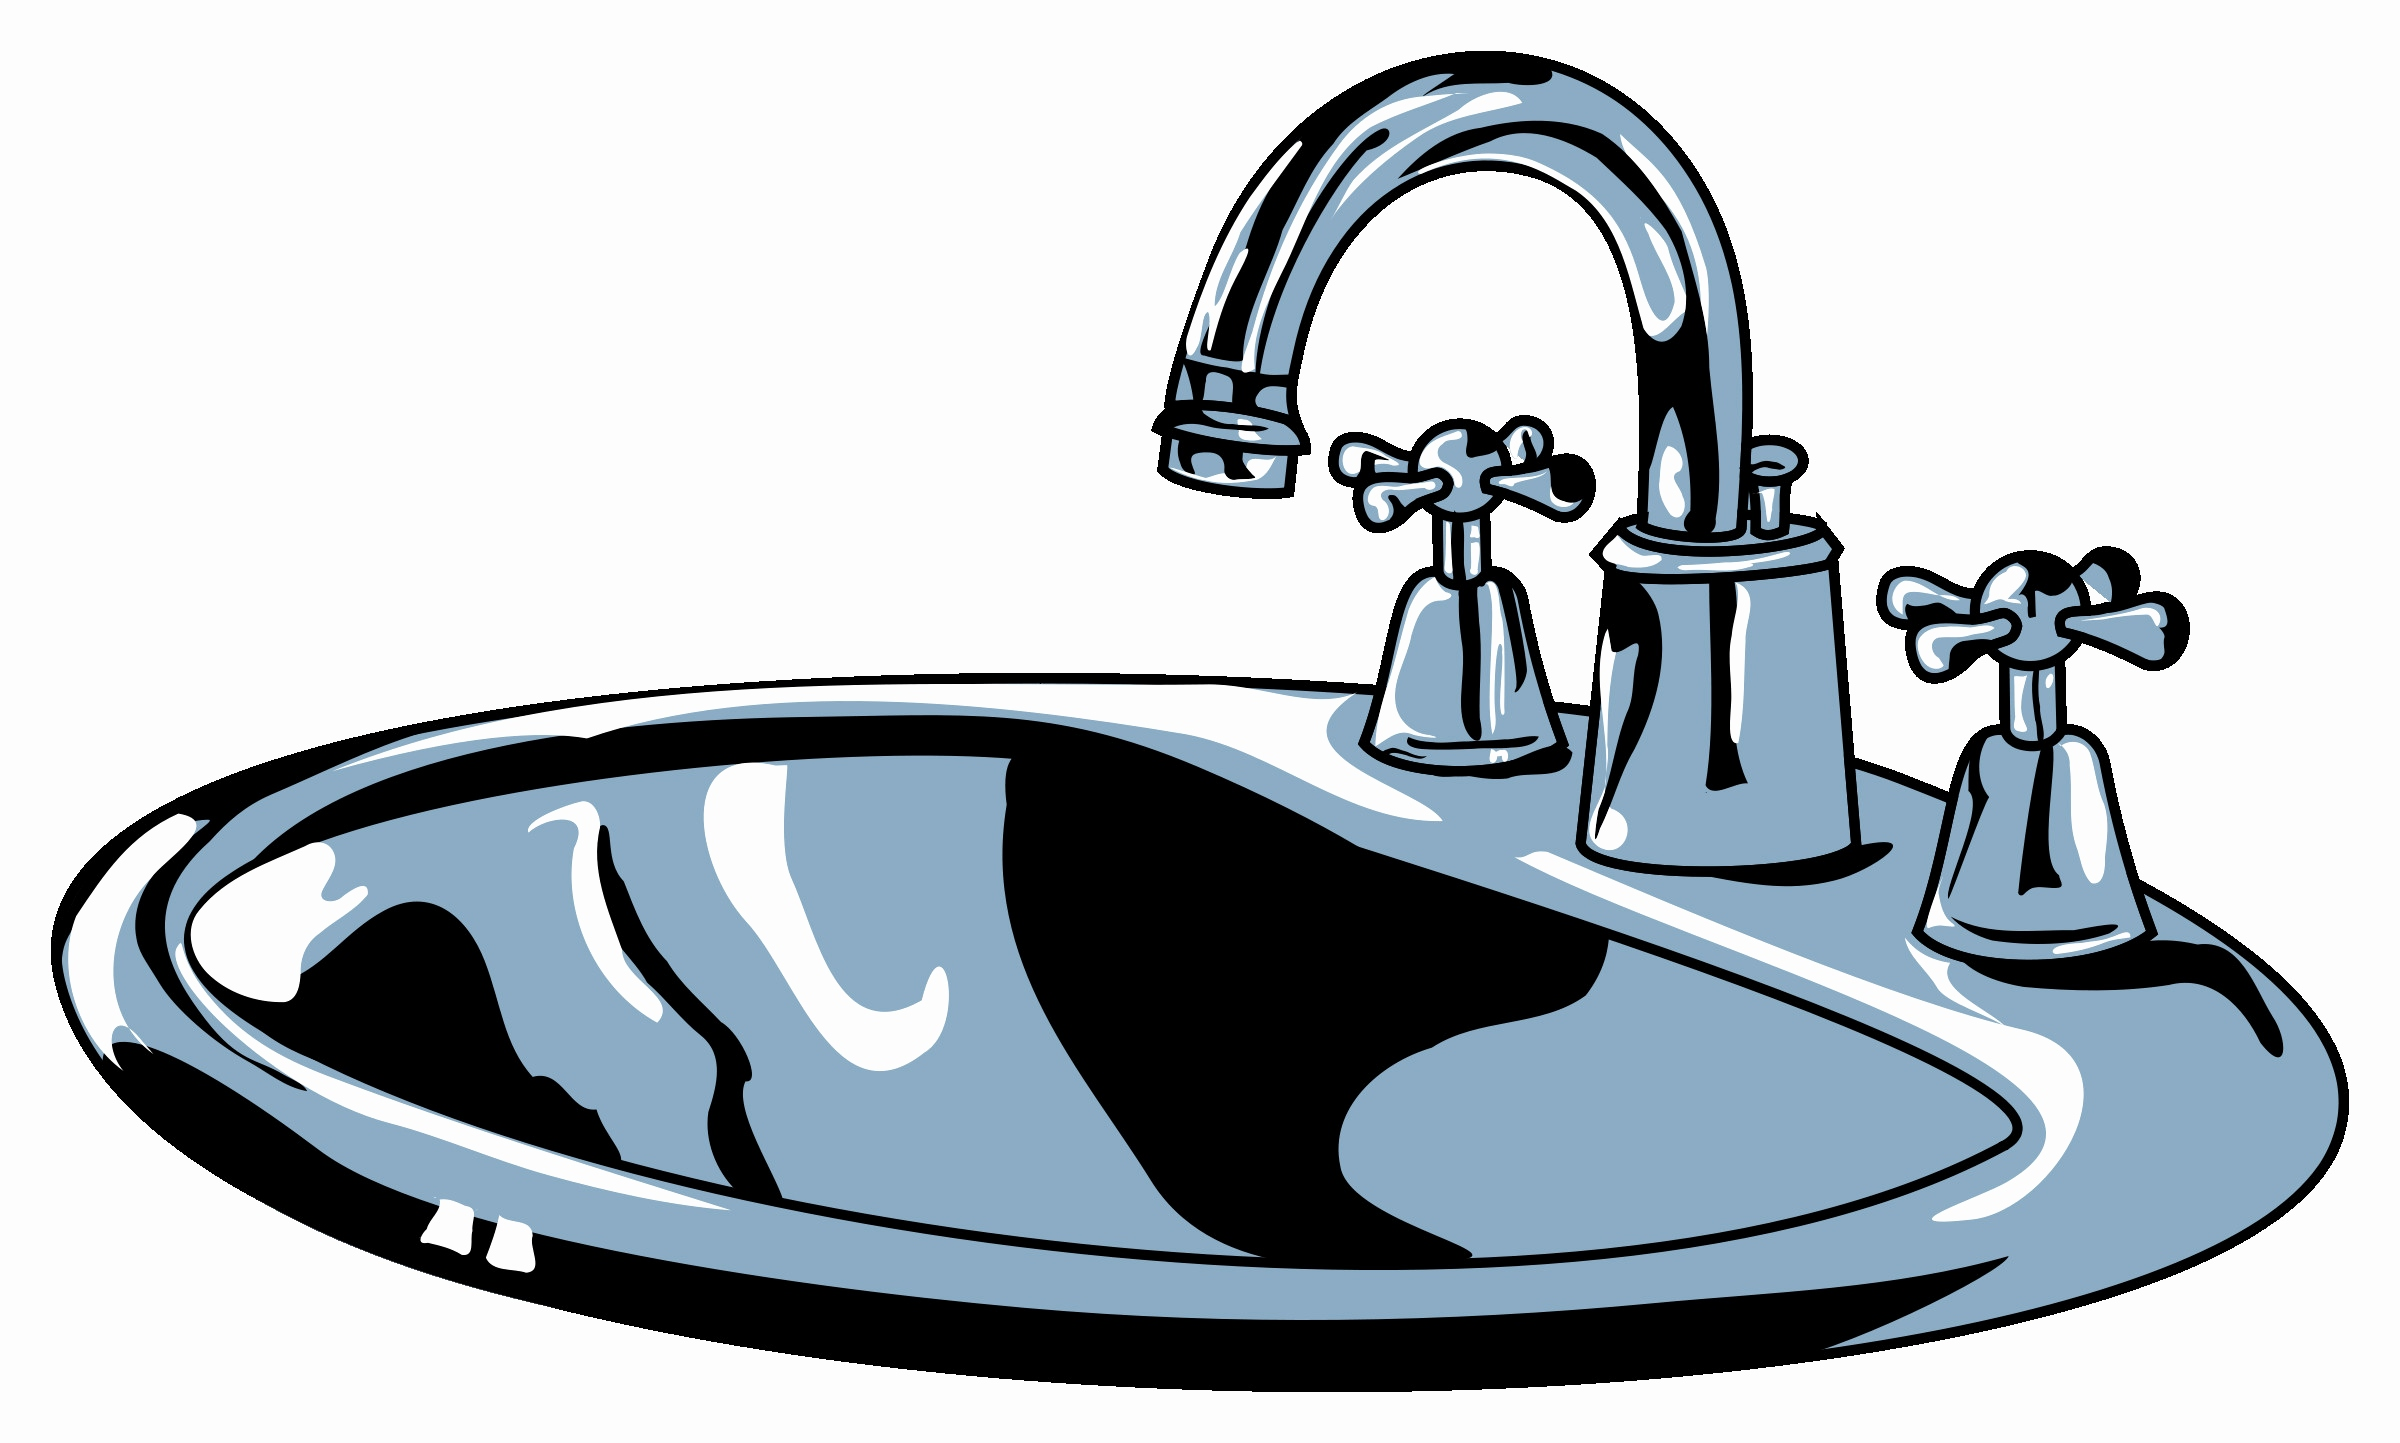 2400x1443 Hands Free Kitchen Faucet Lovely H Sink Clip Art Kitchen Cliparti